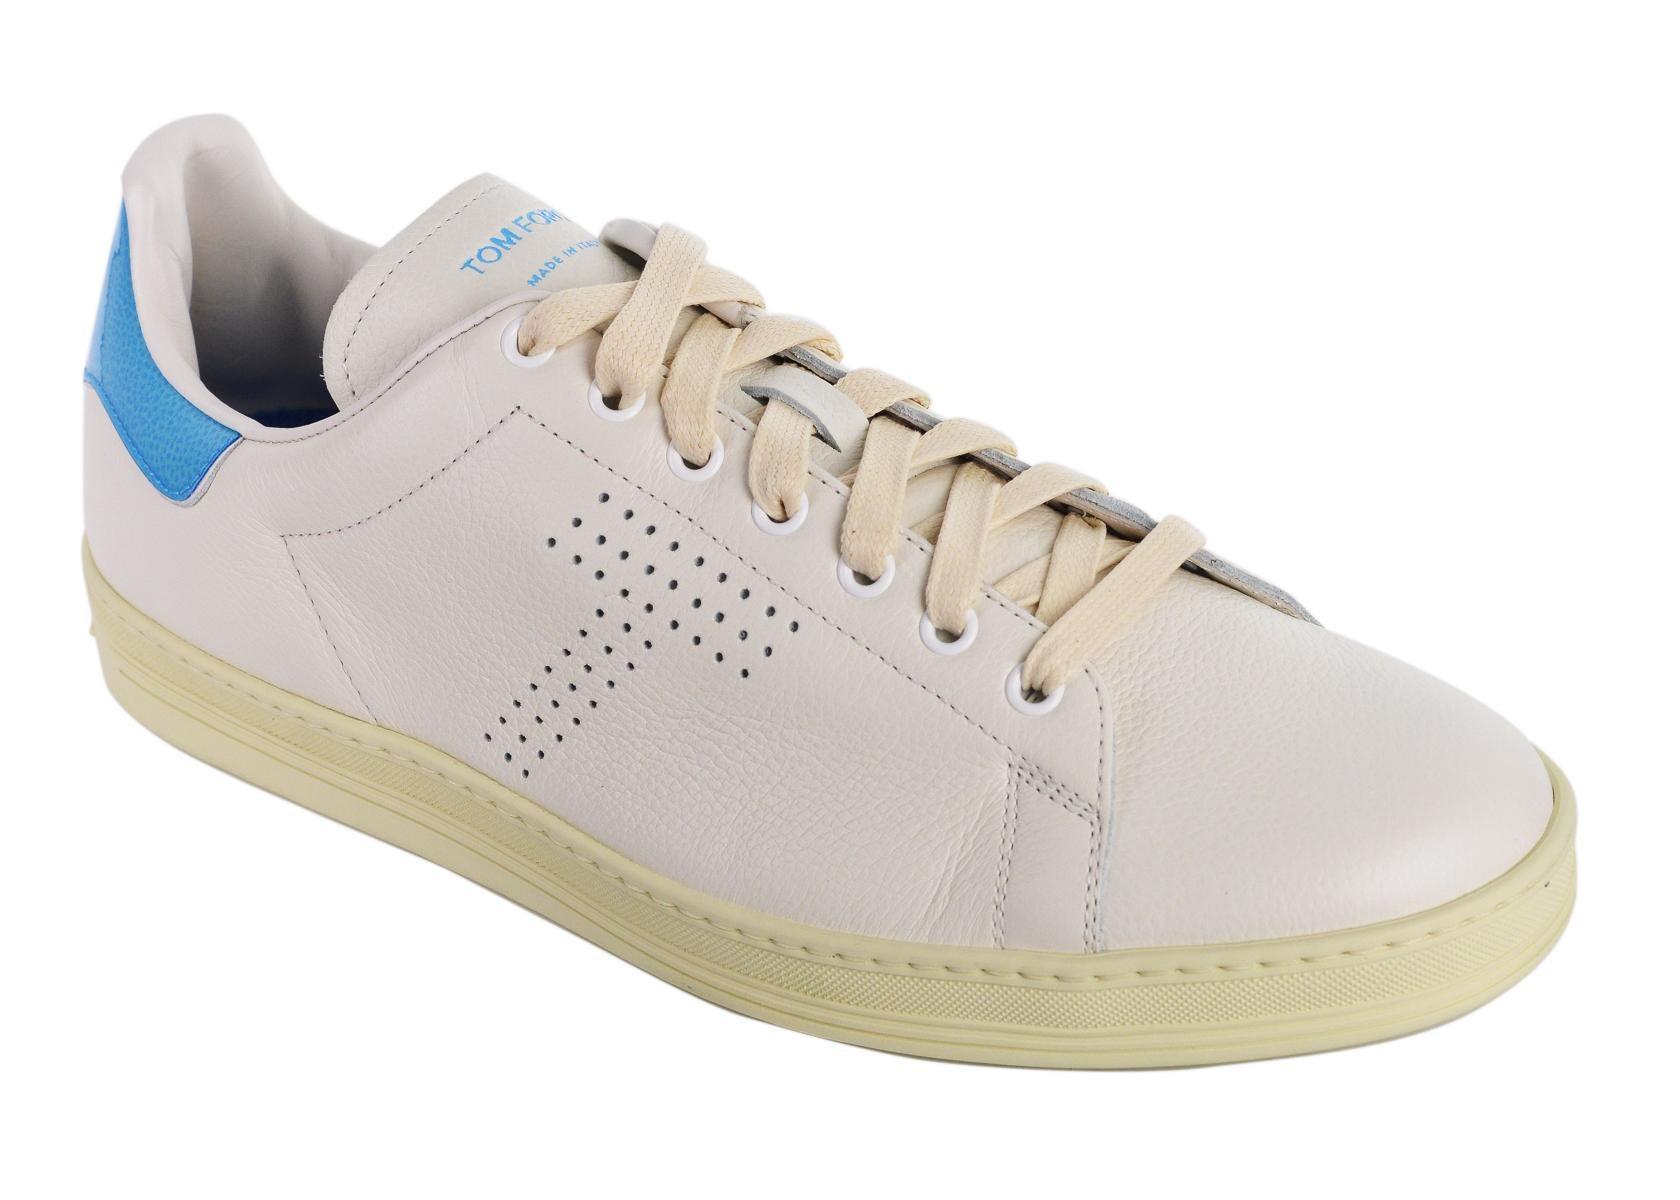 Top Tom Ford Mens White Sneakers Blue Leather Warwick Low w8PkXnON0Z